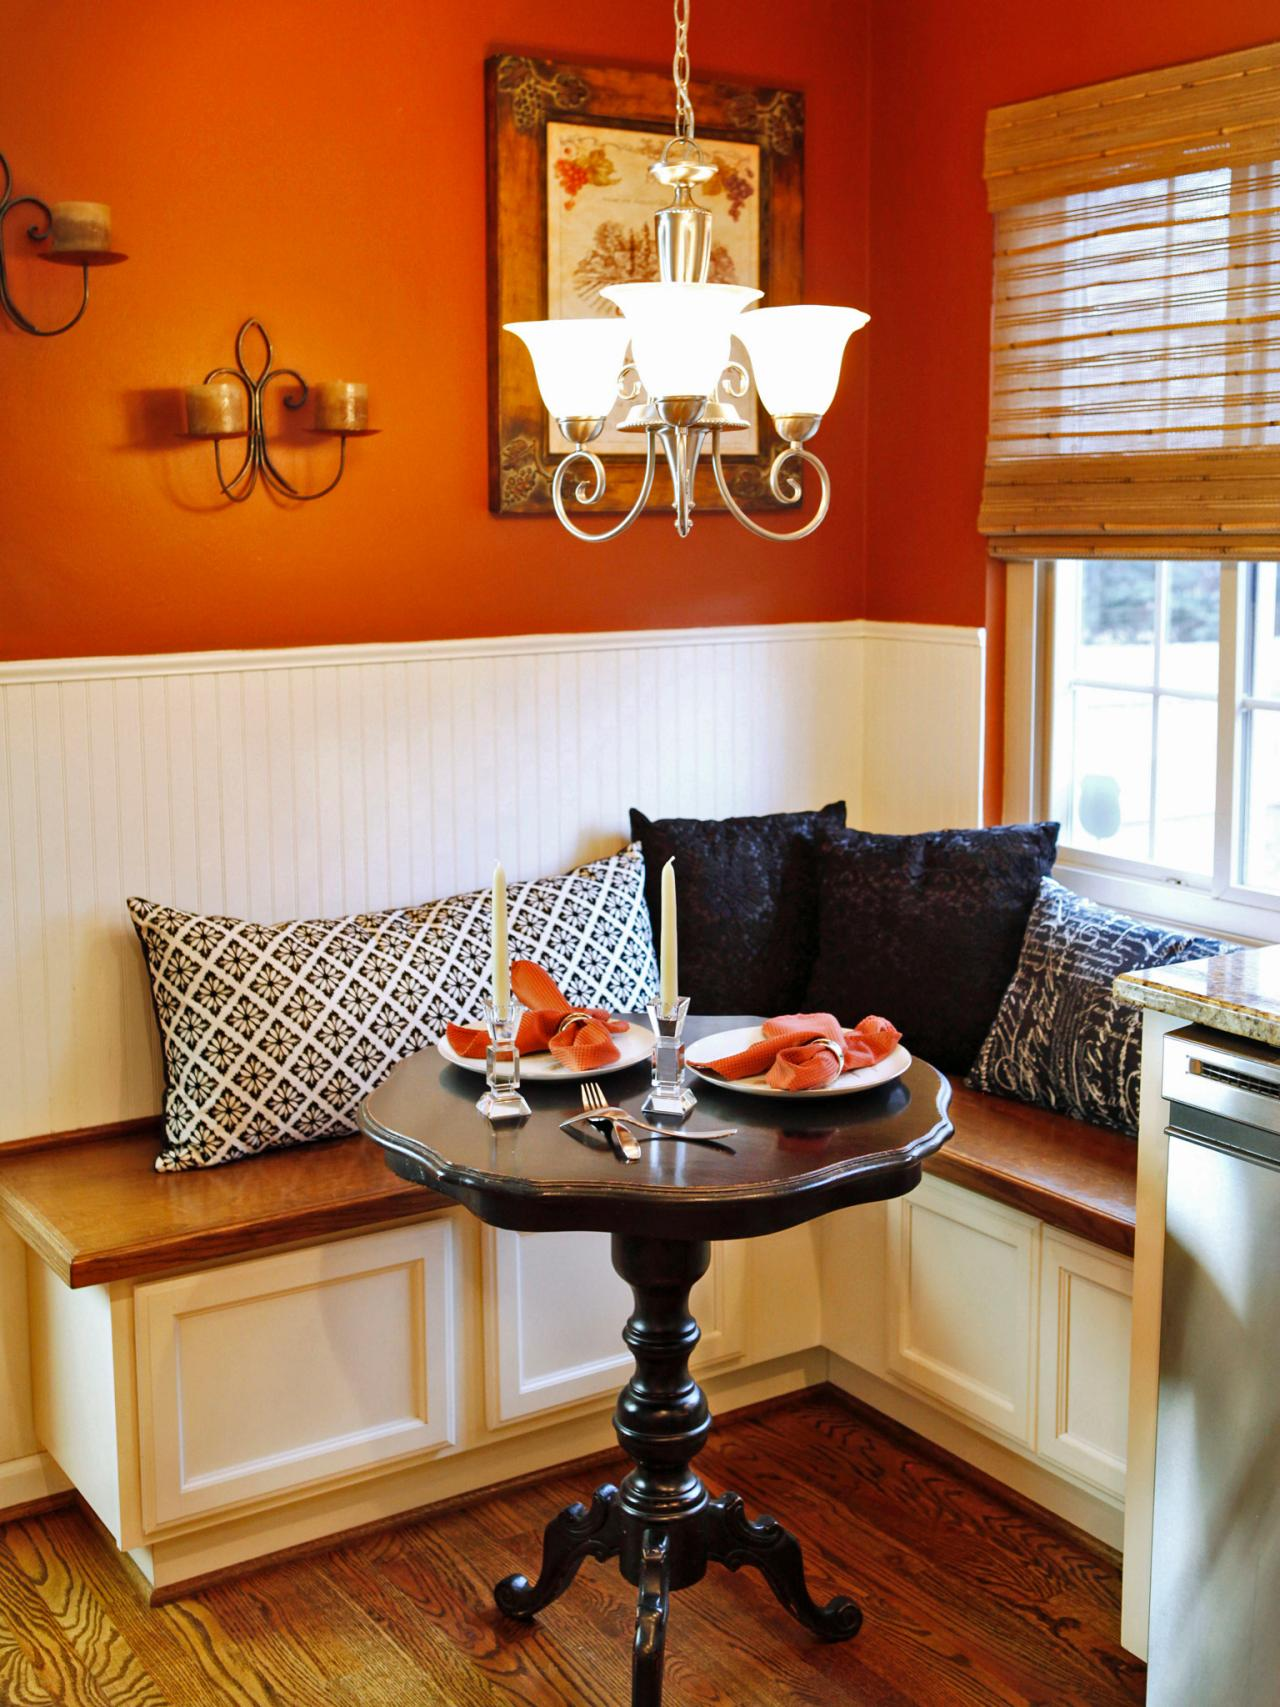 små-køkken-table-ideer-til-inspirere-du-how-to-arrangere-the-køkken-med-Smart-indretning-1